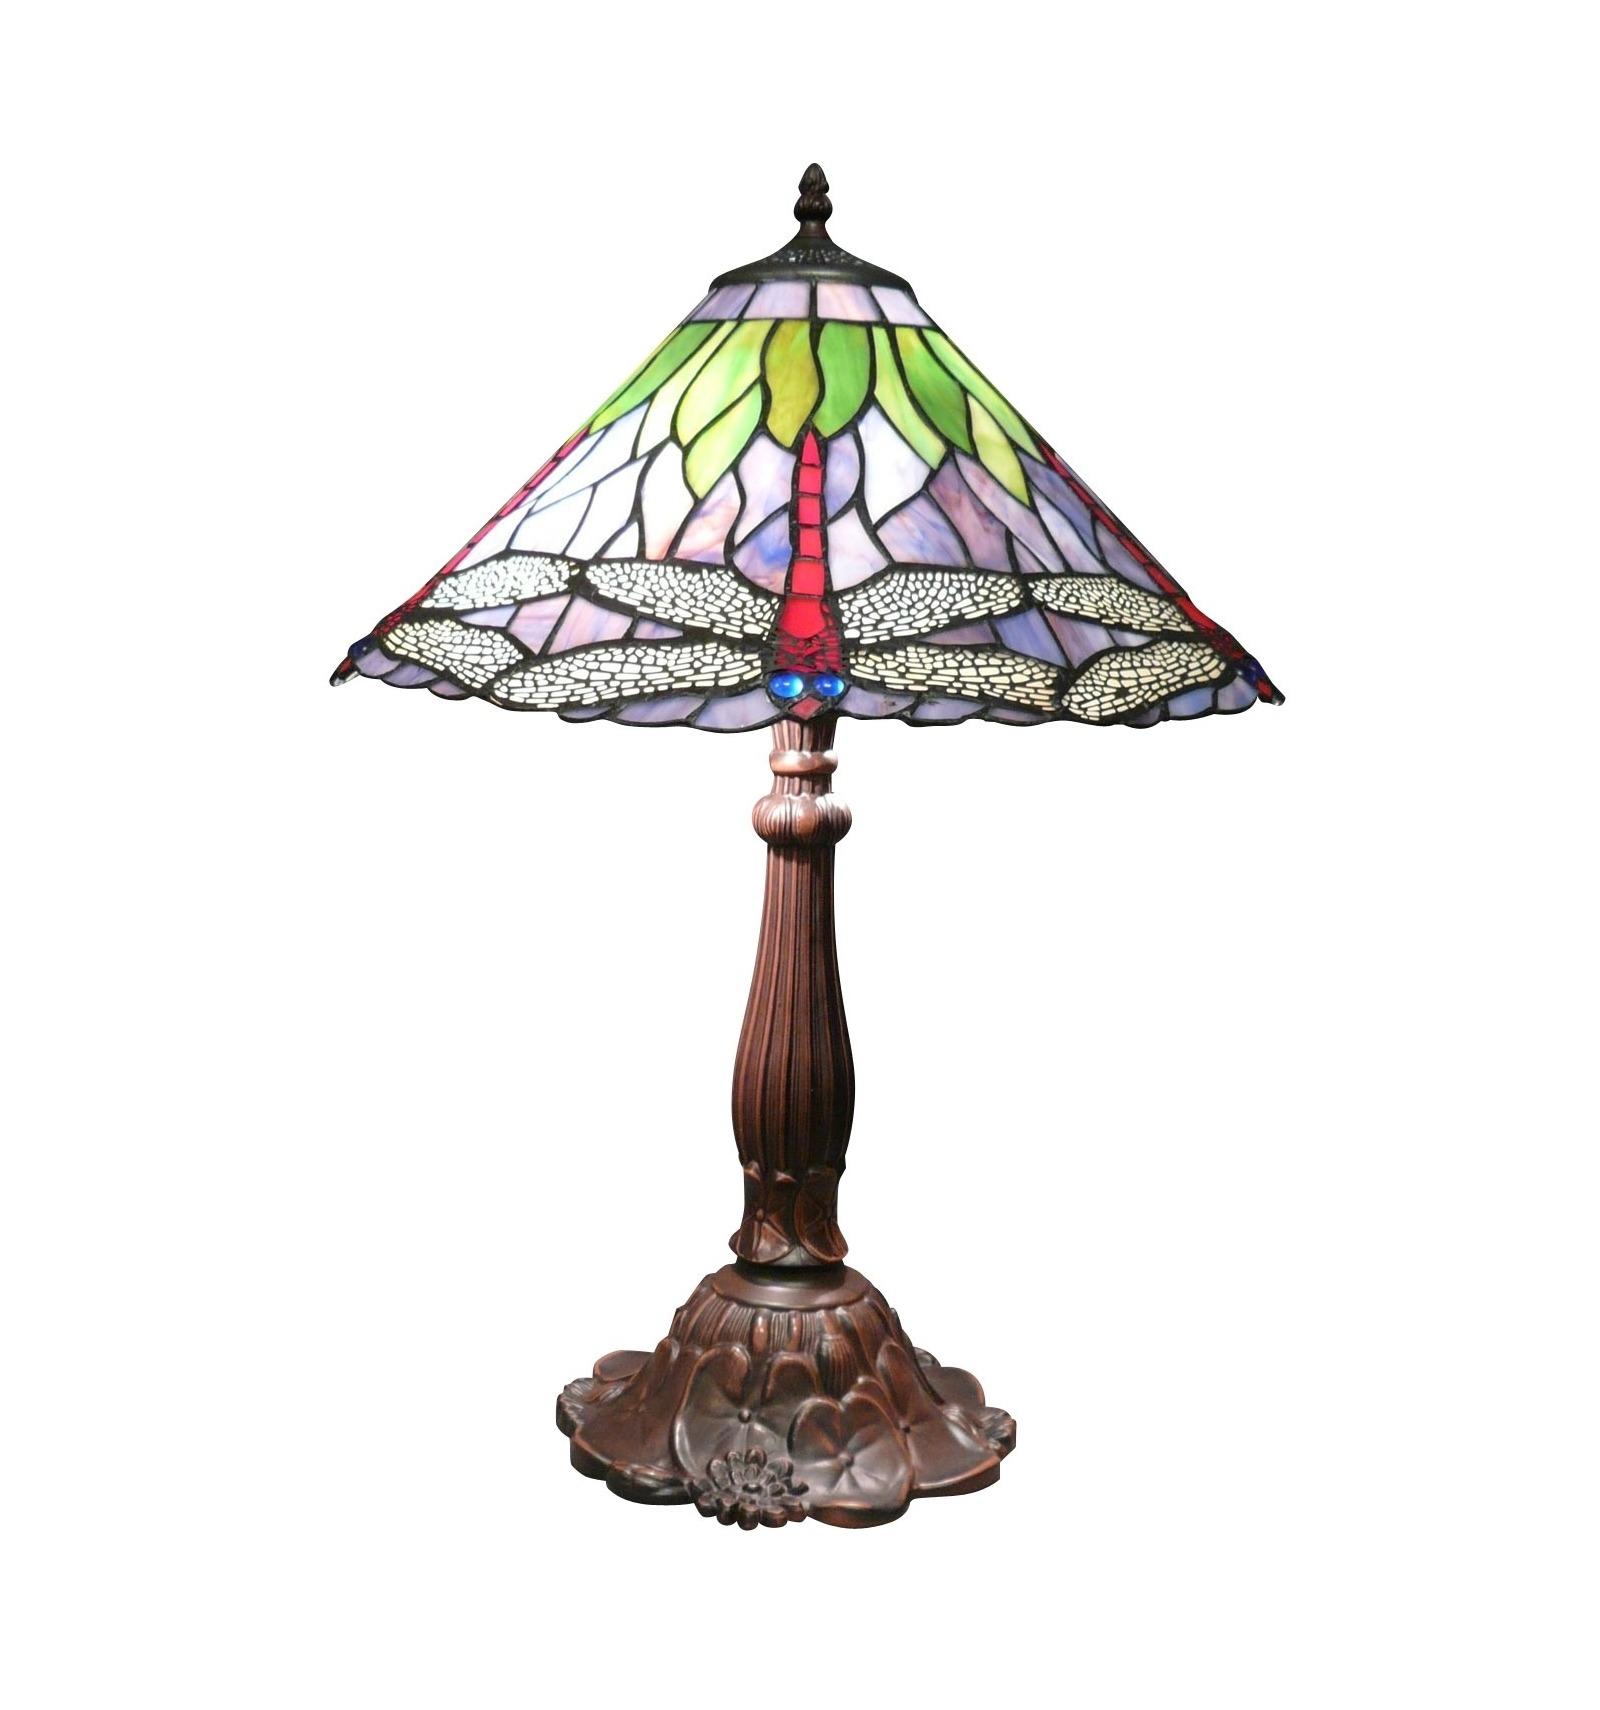 tiffany lamp dragonfly lamps floor chandelier. Black Bedroom Furniture Sets. Home Design Ideas